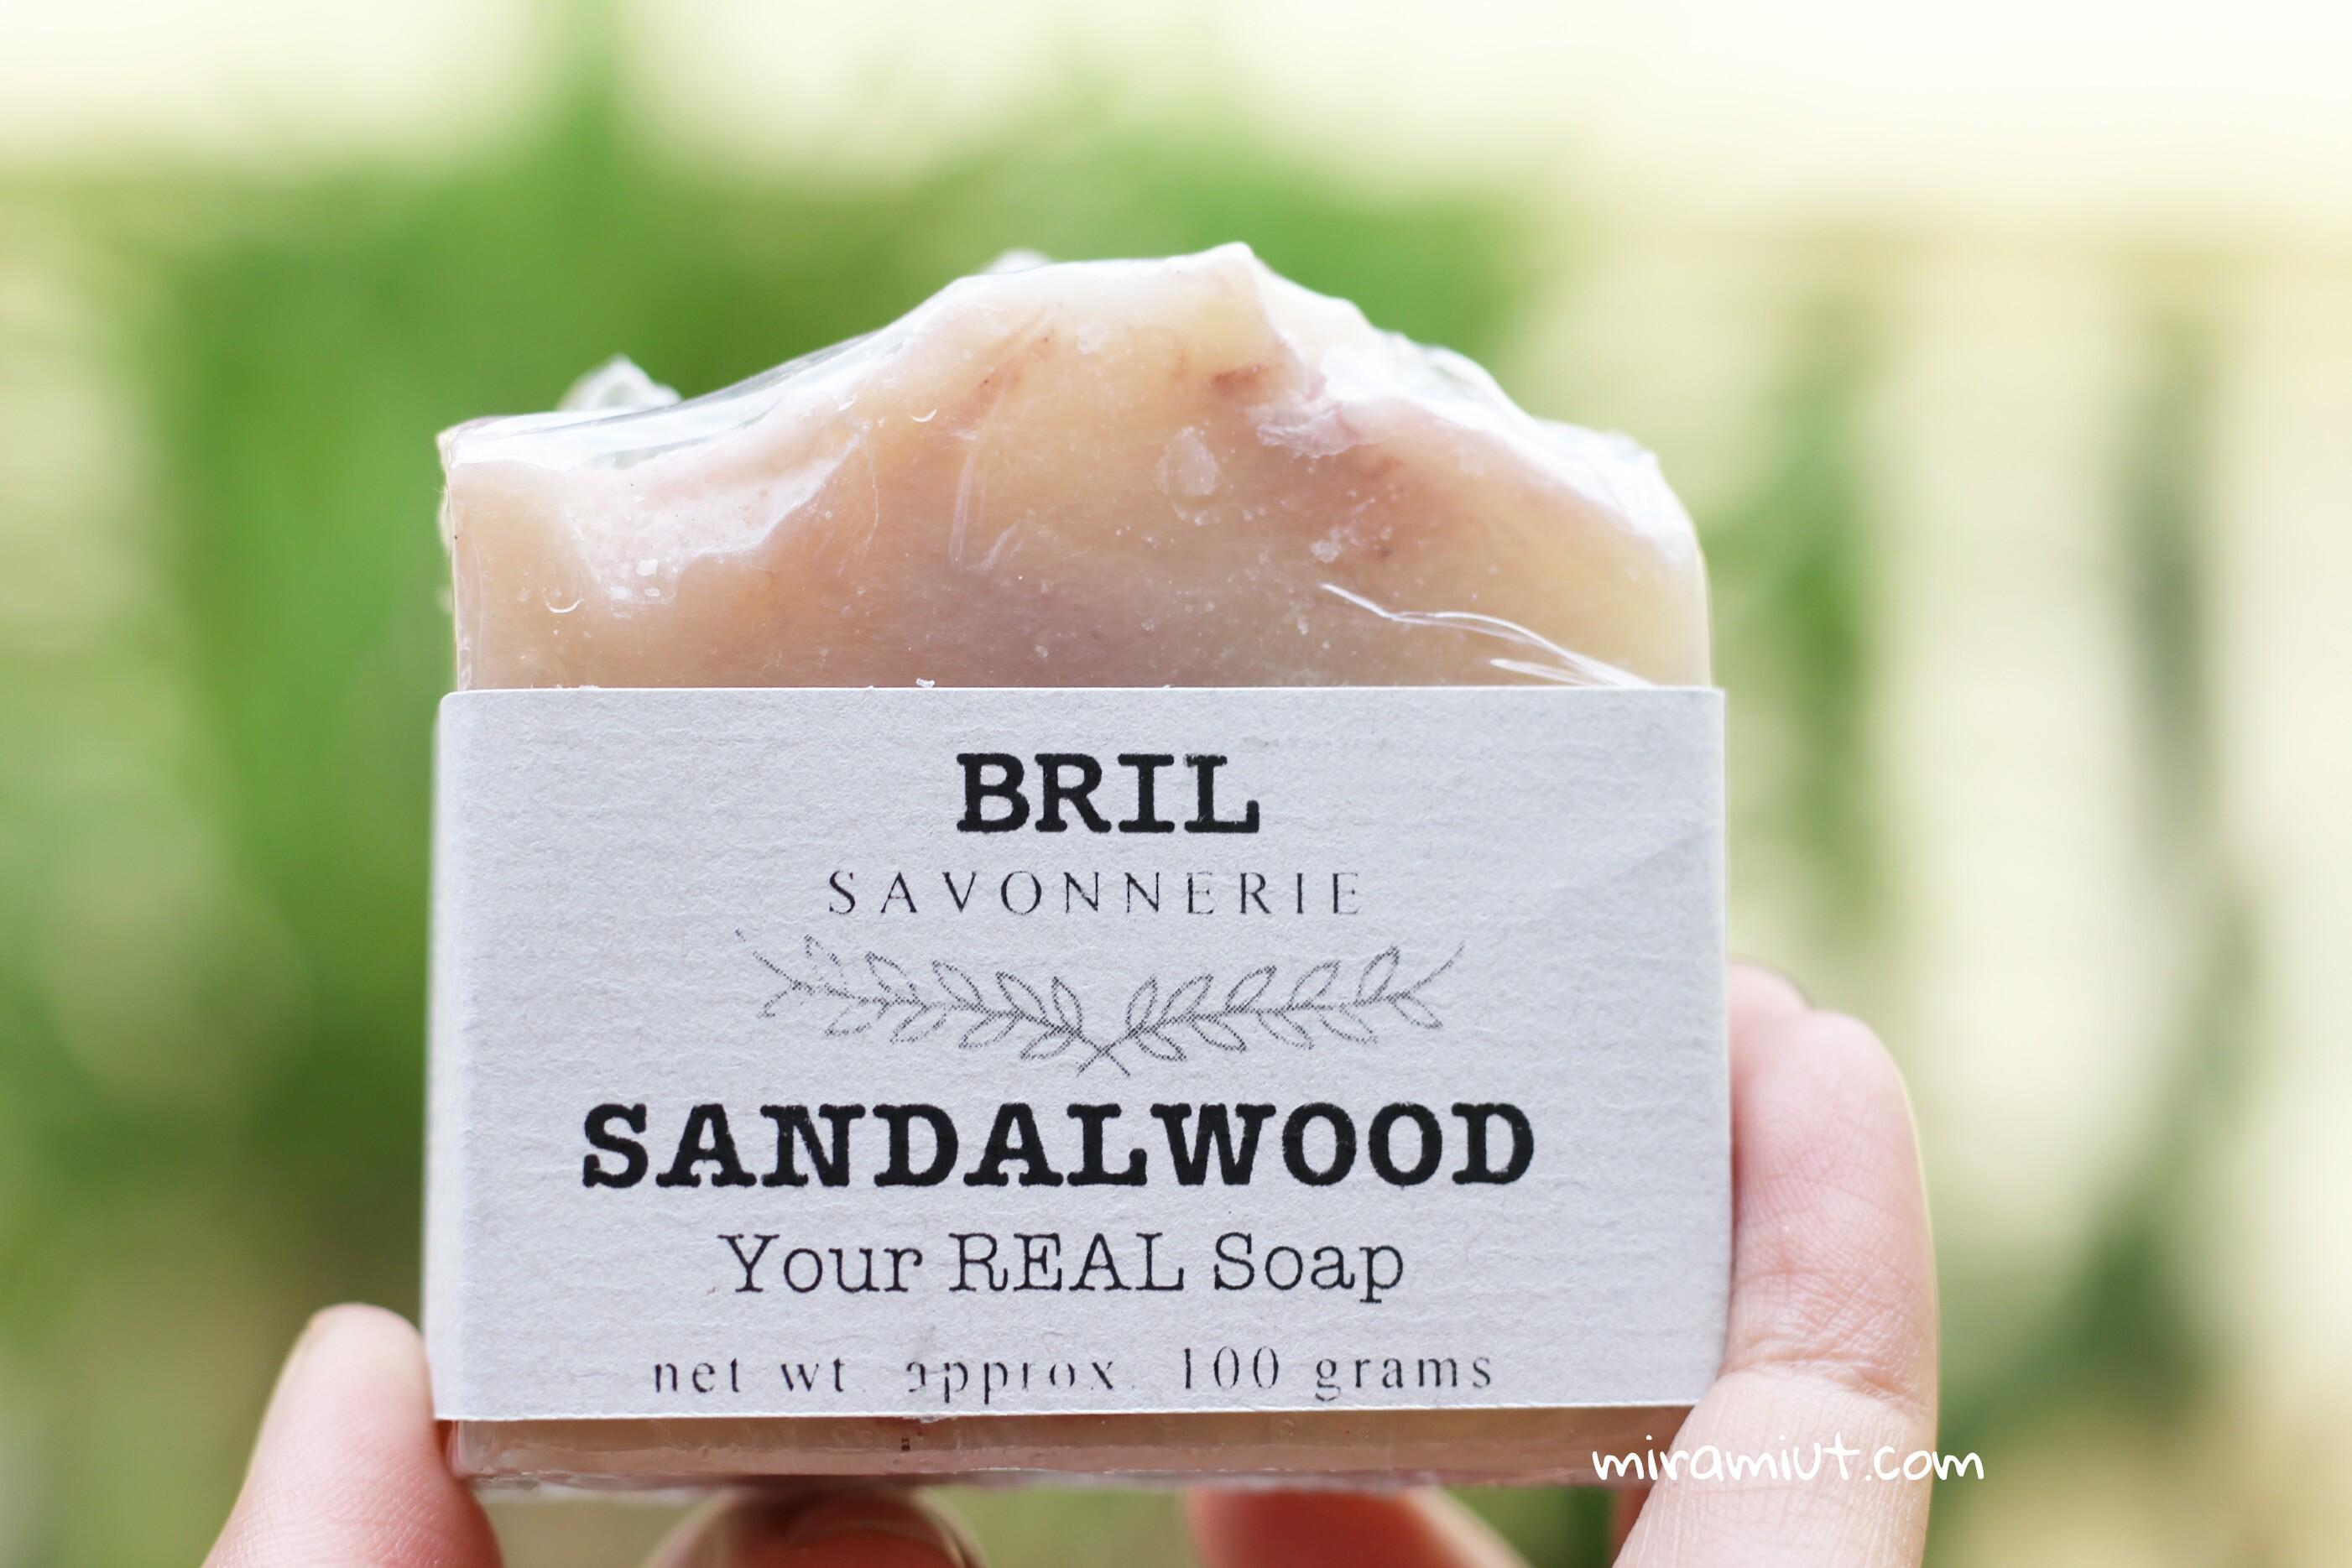 bahan alami sandalwood bril savonnerie